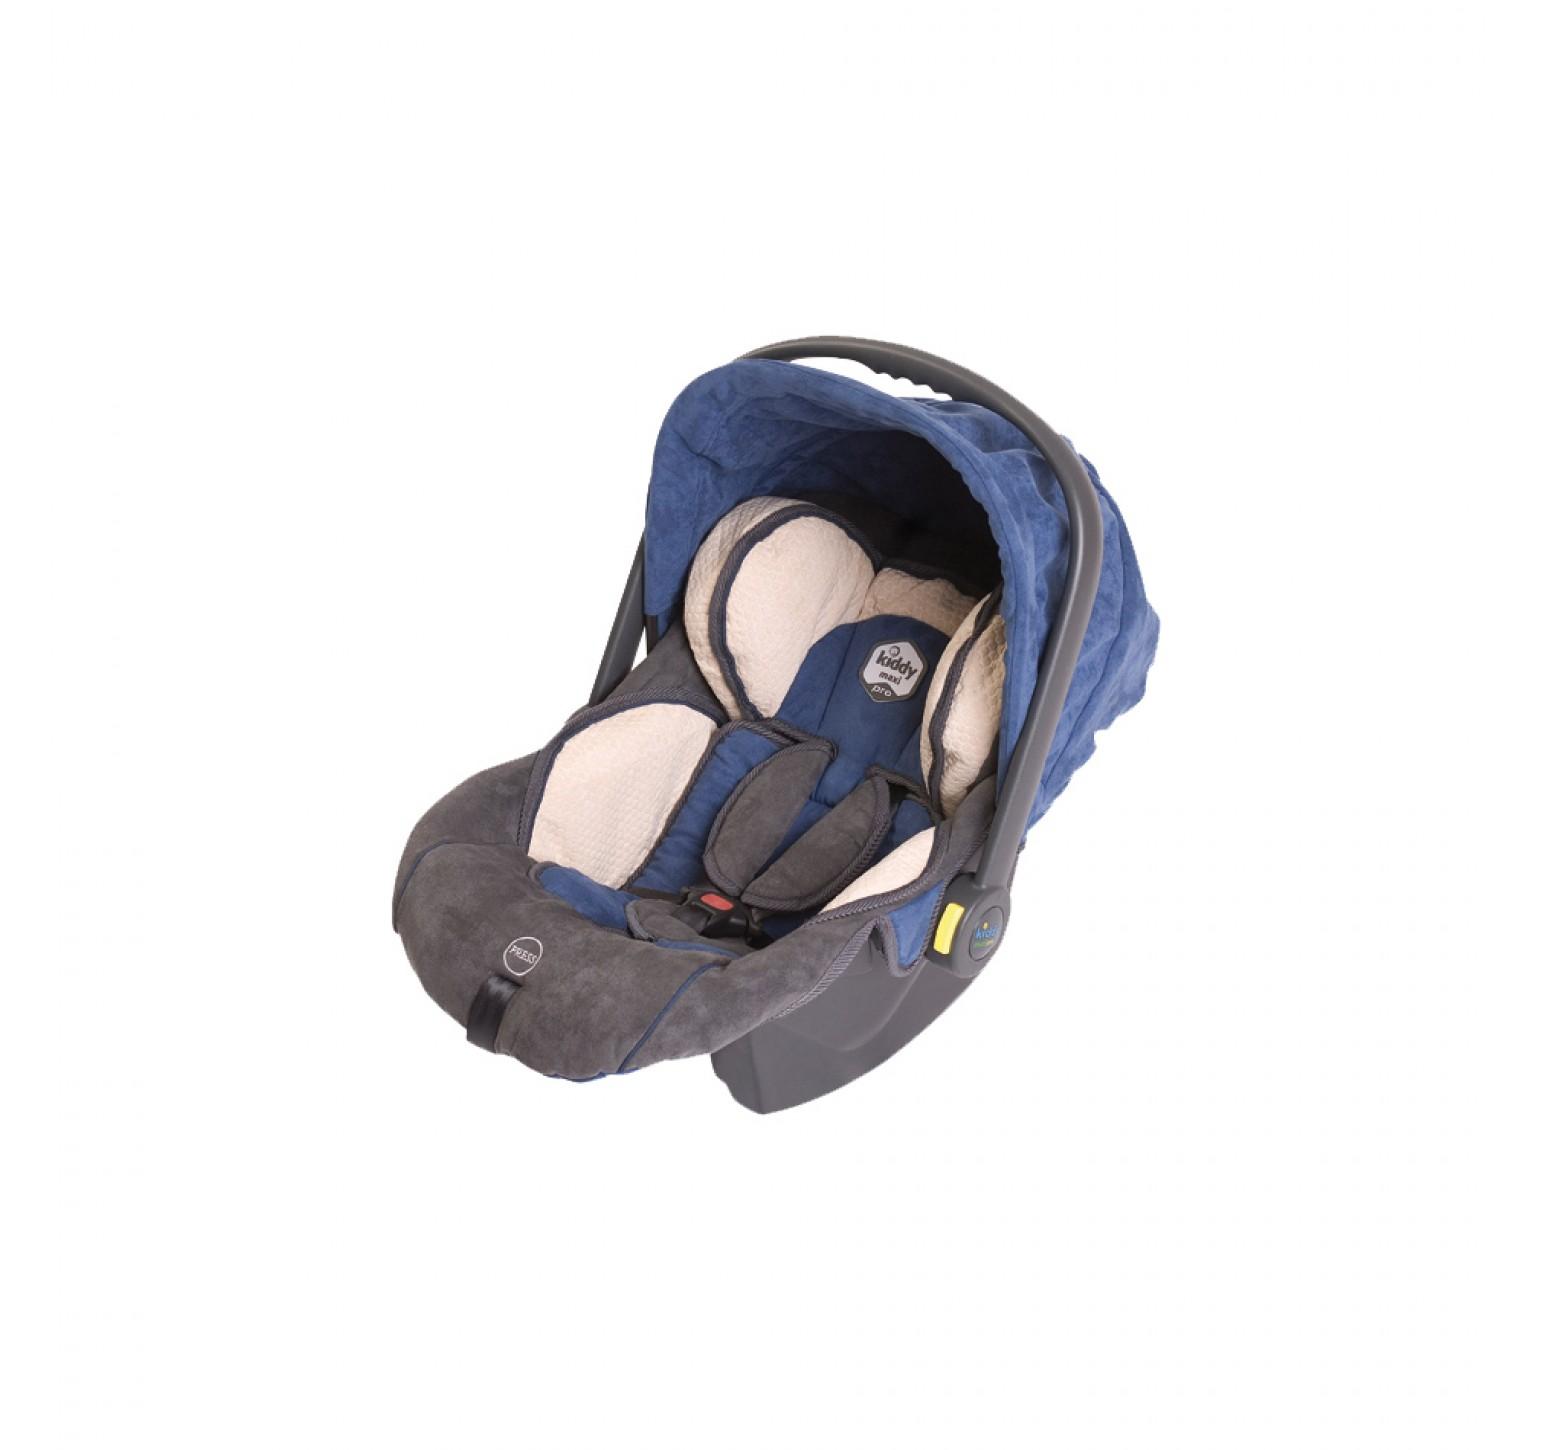 Kiddy Silla para auto Maxi Pro Baby Seat